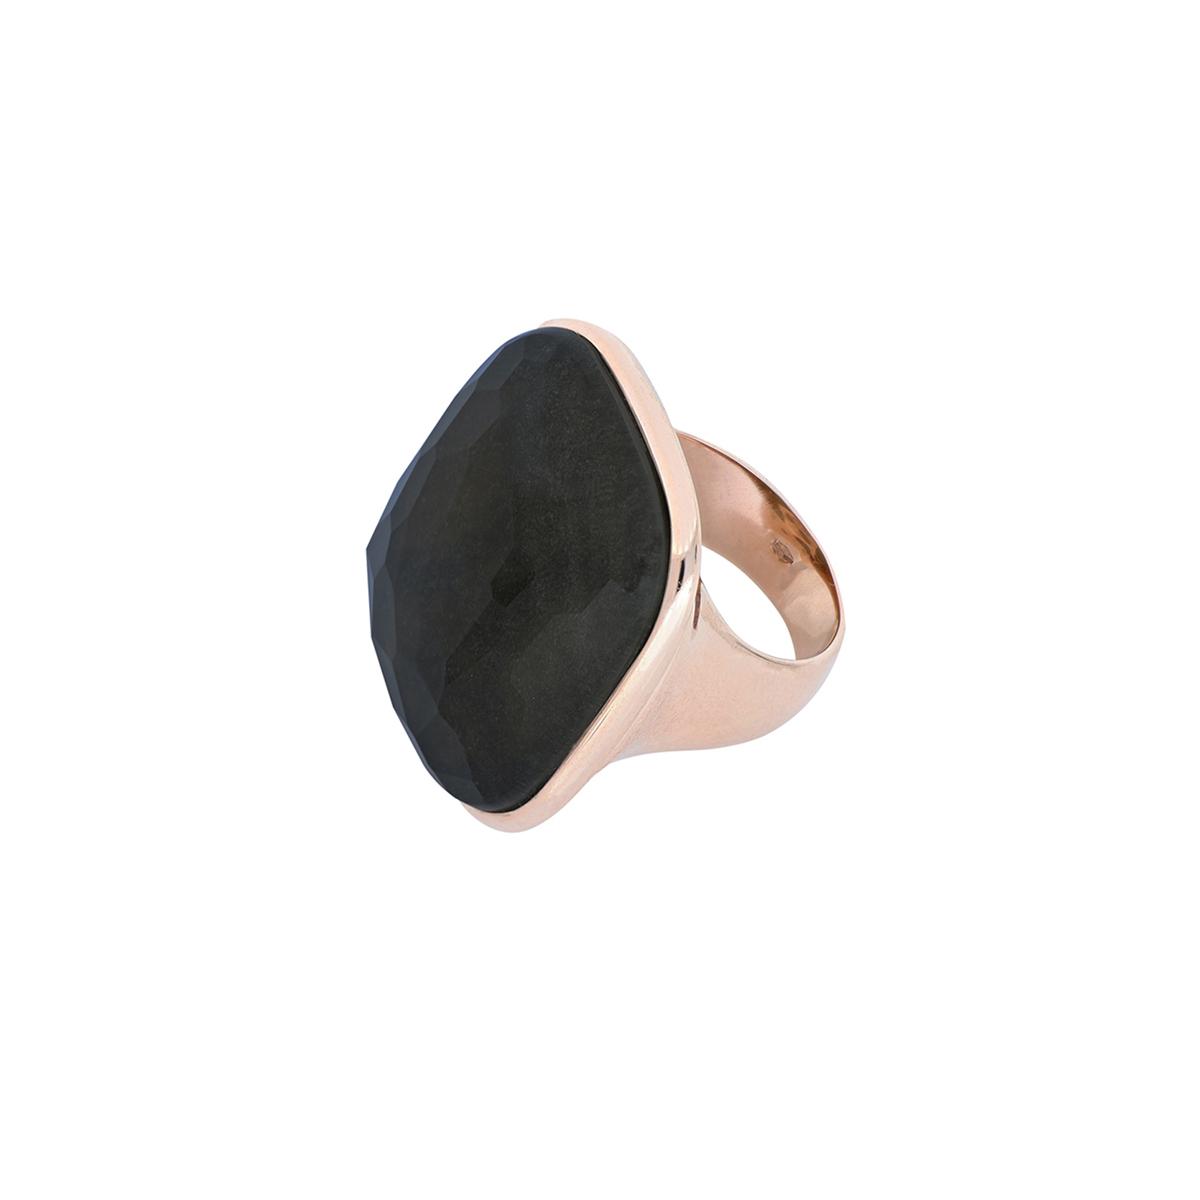 Multiple Facet Cut Quartz And Silver Obsidian Ring